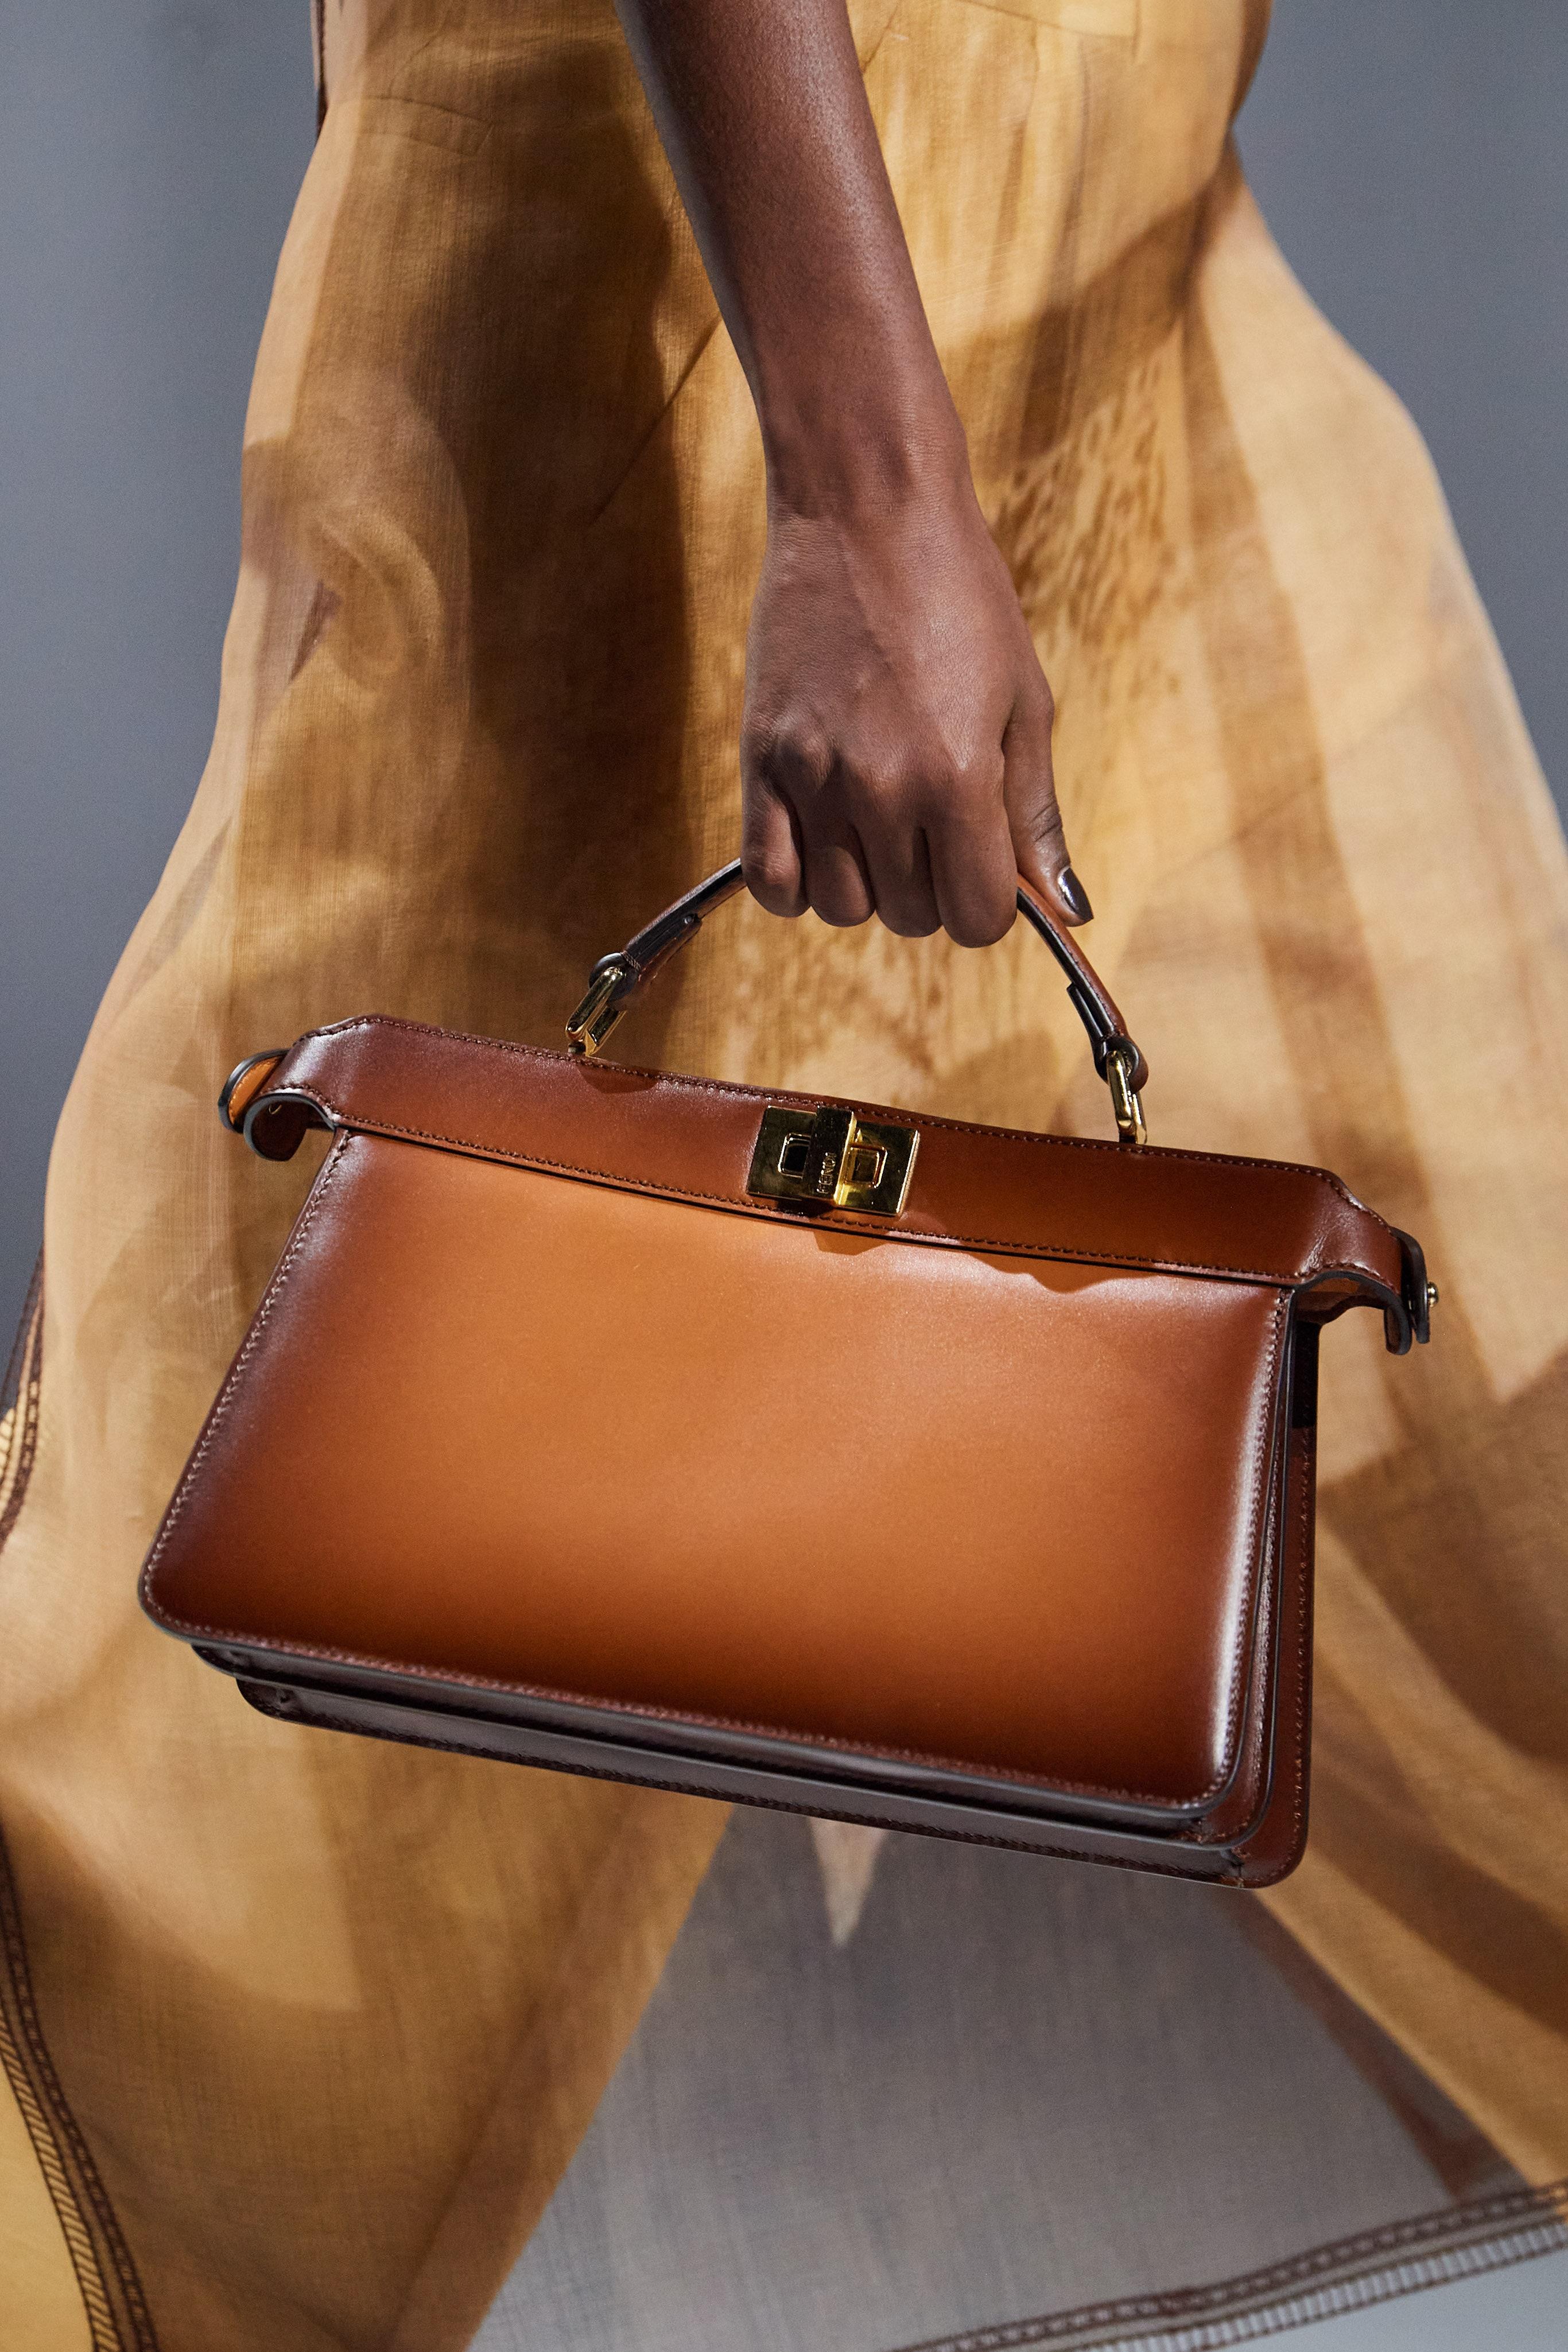 Fendi 2021ss Milan fashion week handbags accessories collection Silvia Venturini Fendi